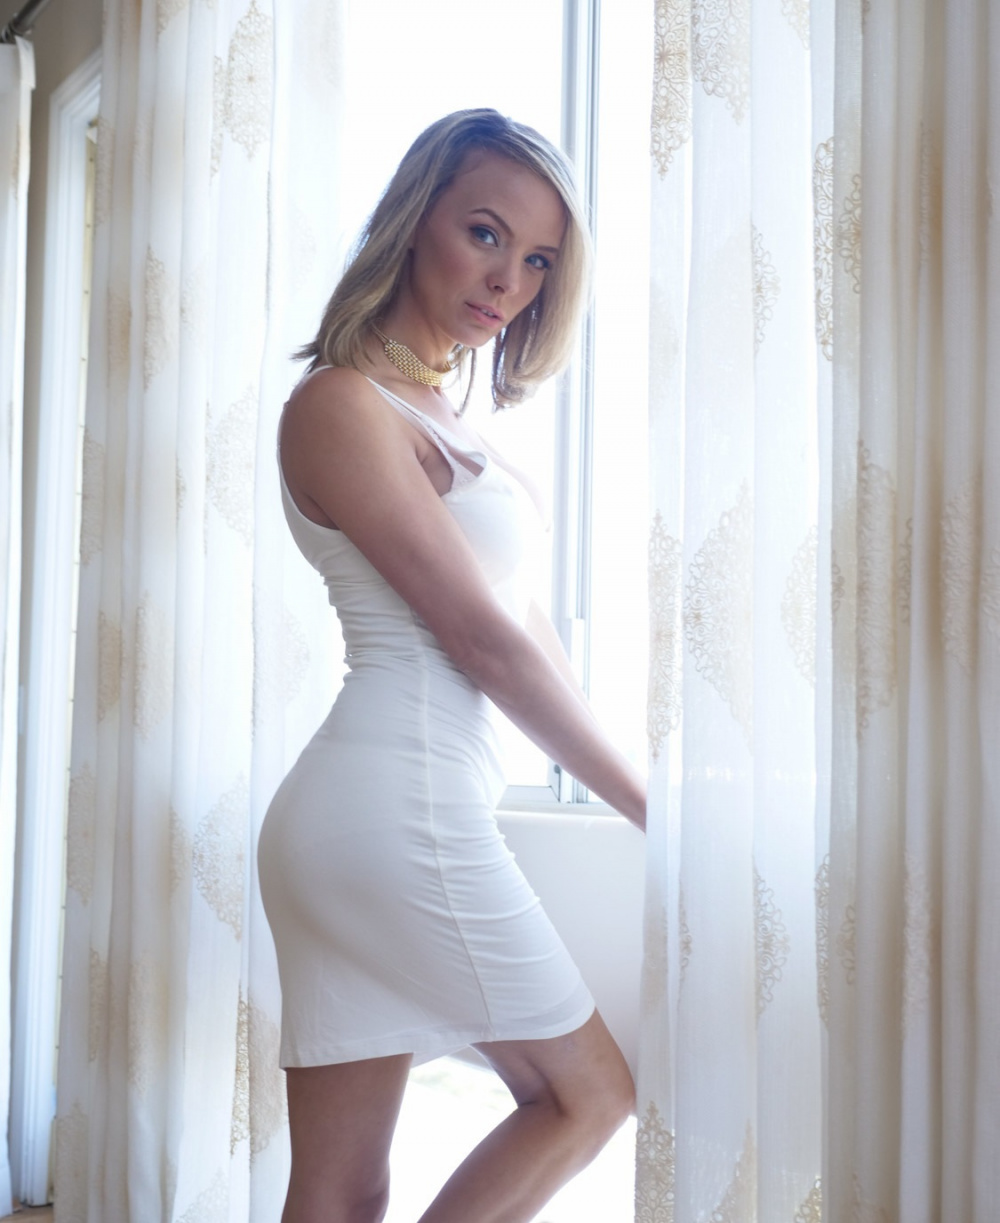 Natalie Gregory Nude Photos 17